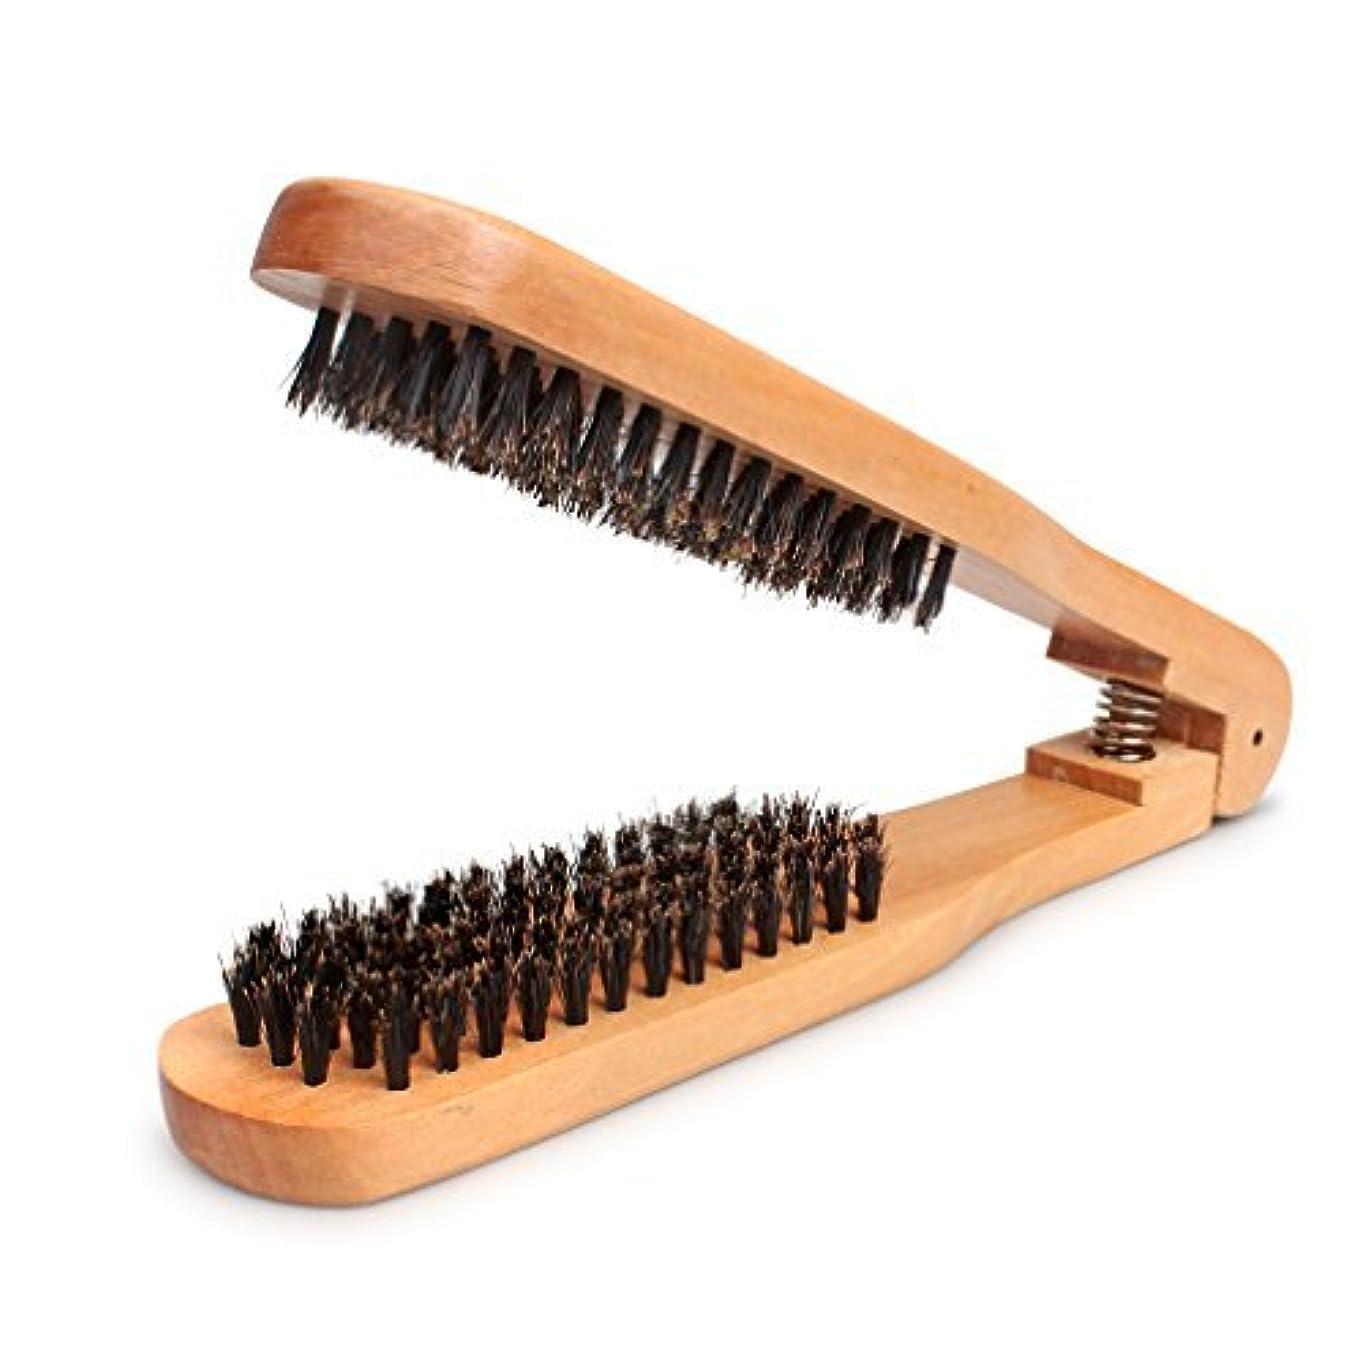 Amariver DIY Salon Hairdressing Hair Straightener Wooden Anti-static Dual-Brush Comb [並行輸入品]